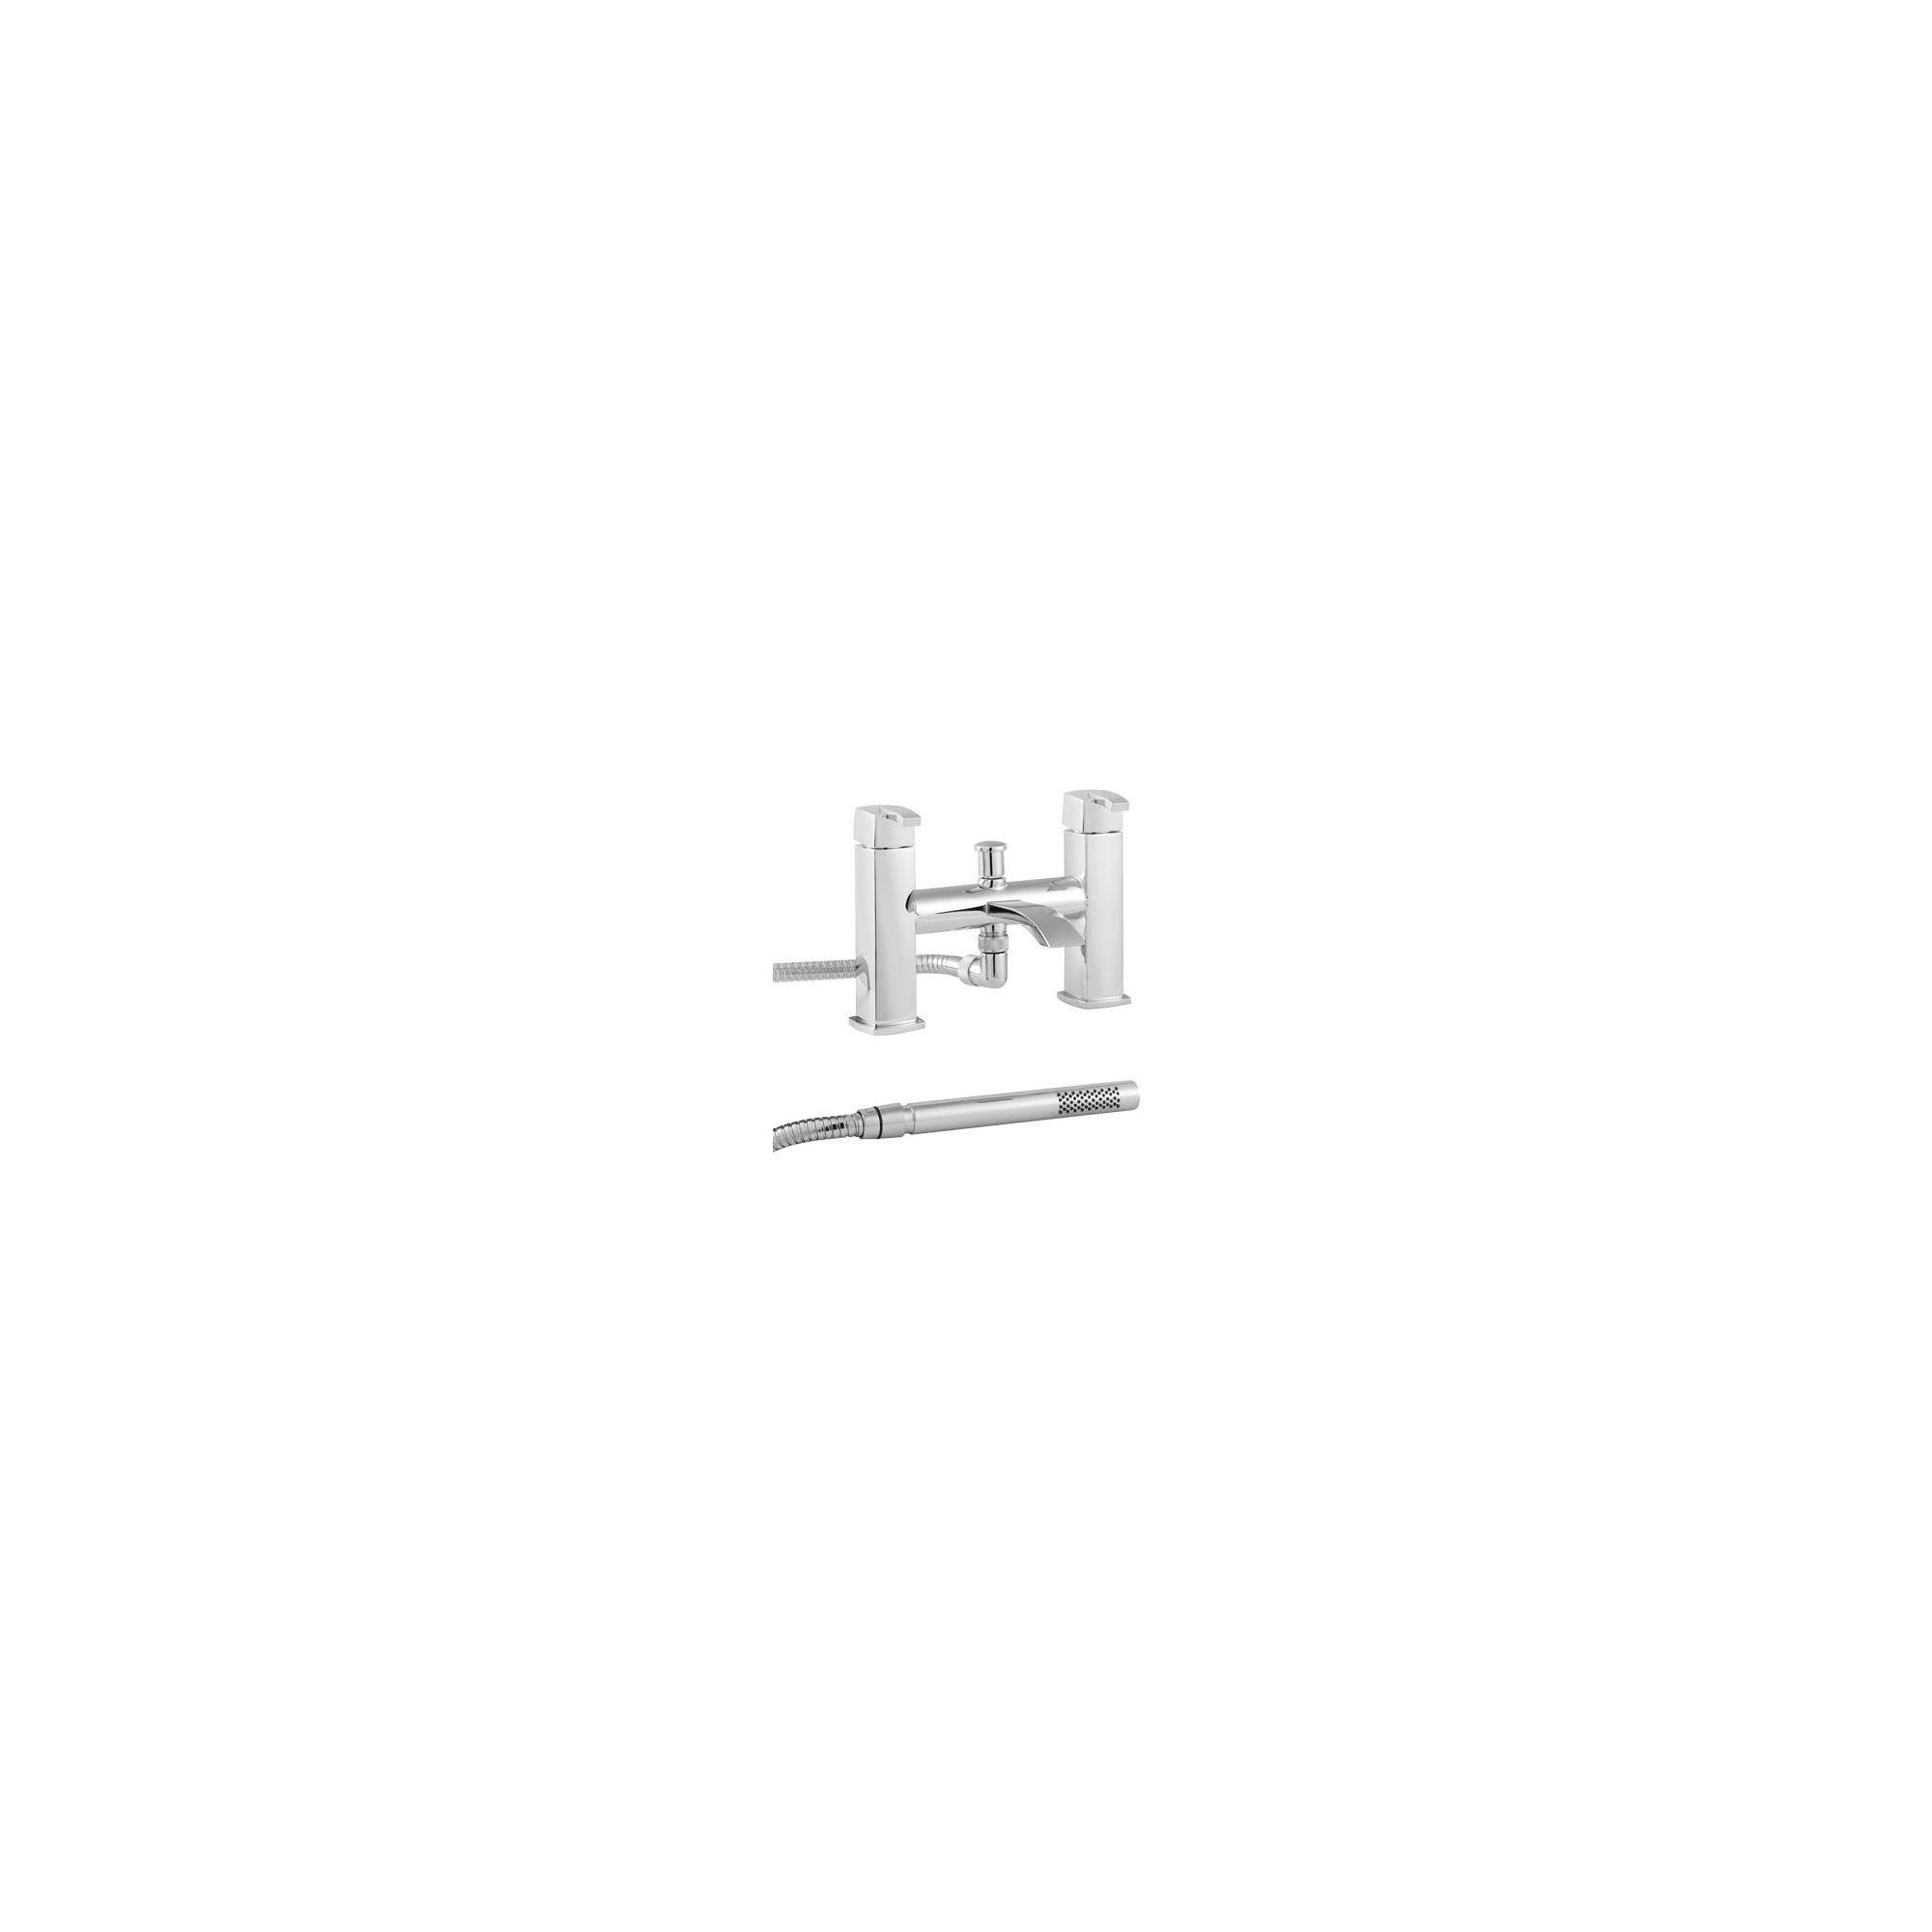 Twyford QB Deck Mounted Bath Shower Mixer Tap Chrome at Tesco Direct